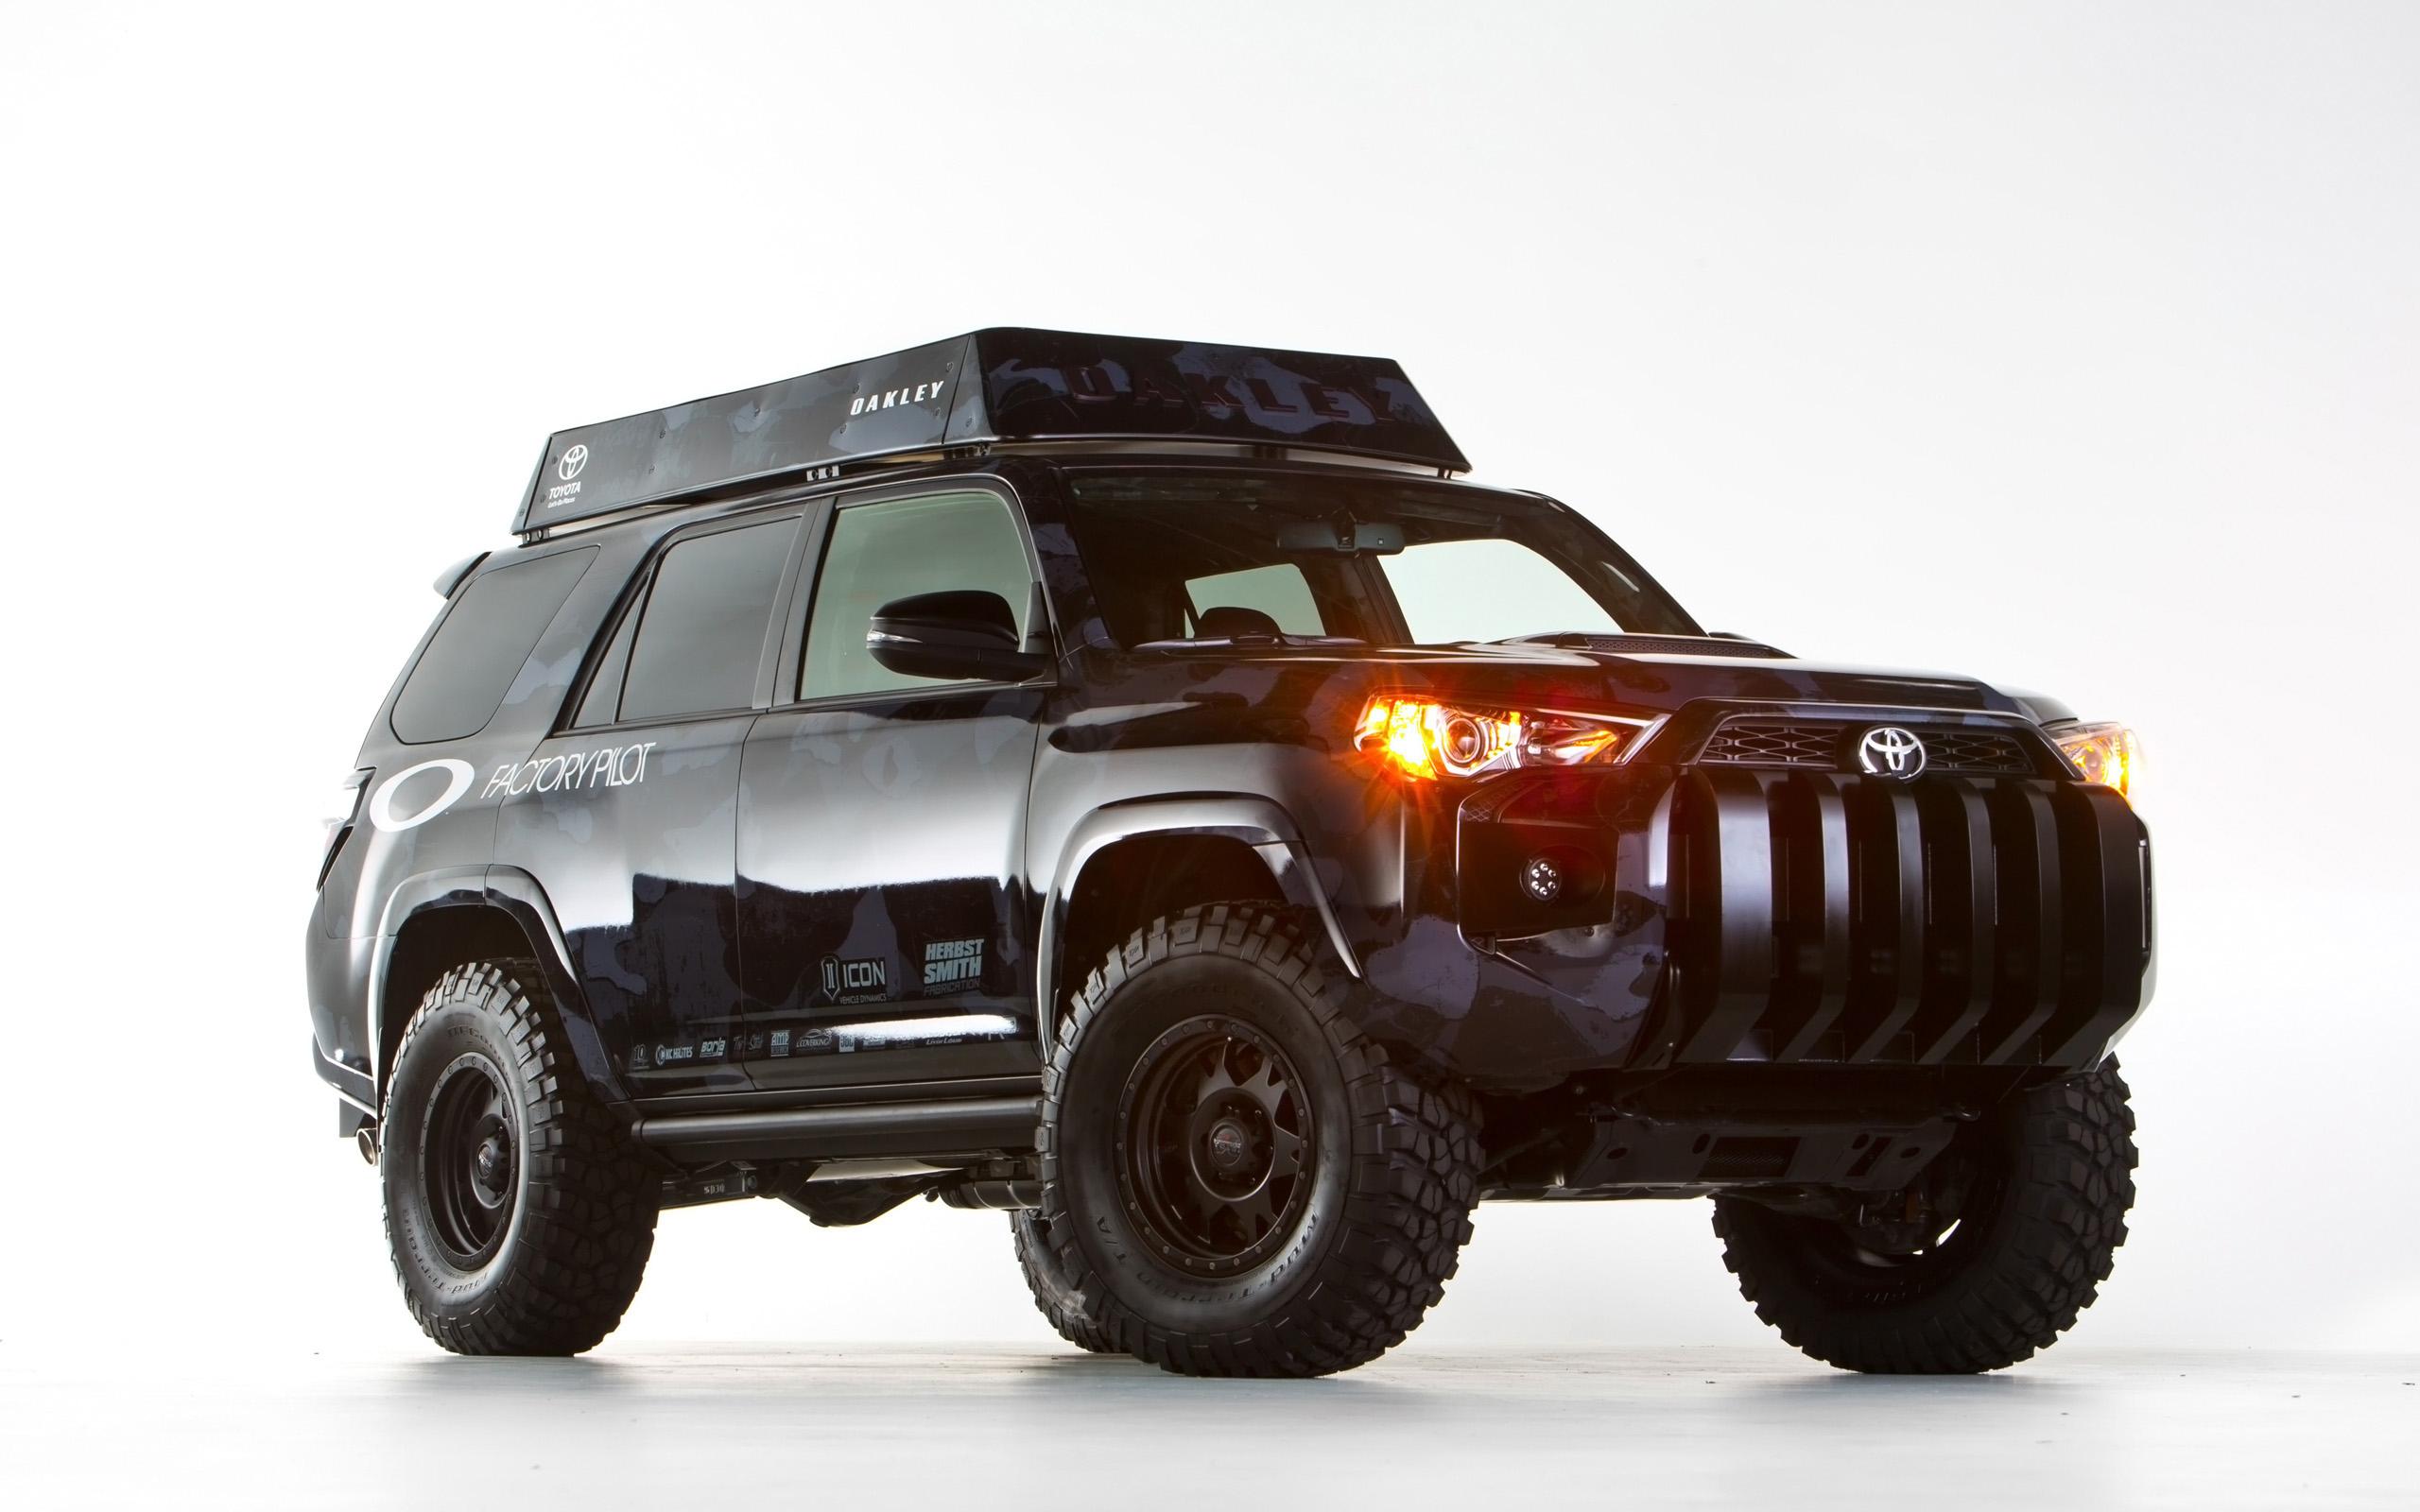 2013 Toyota Dream Build Ultimate Dream Ski 4Runner by ThexRealxBanks